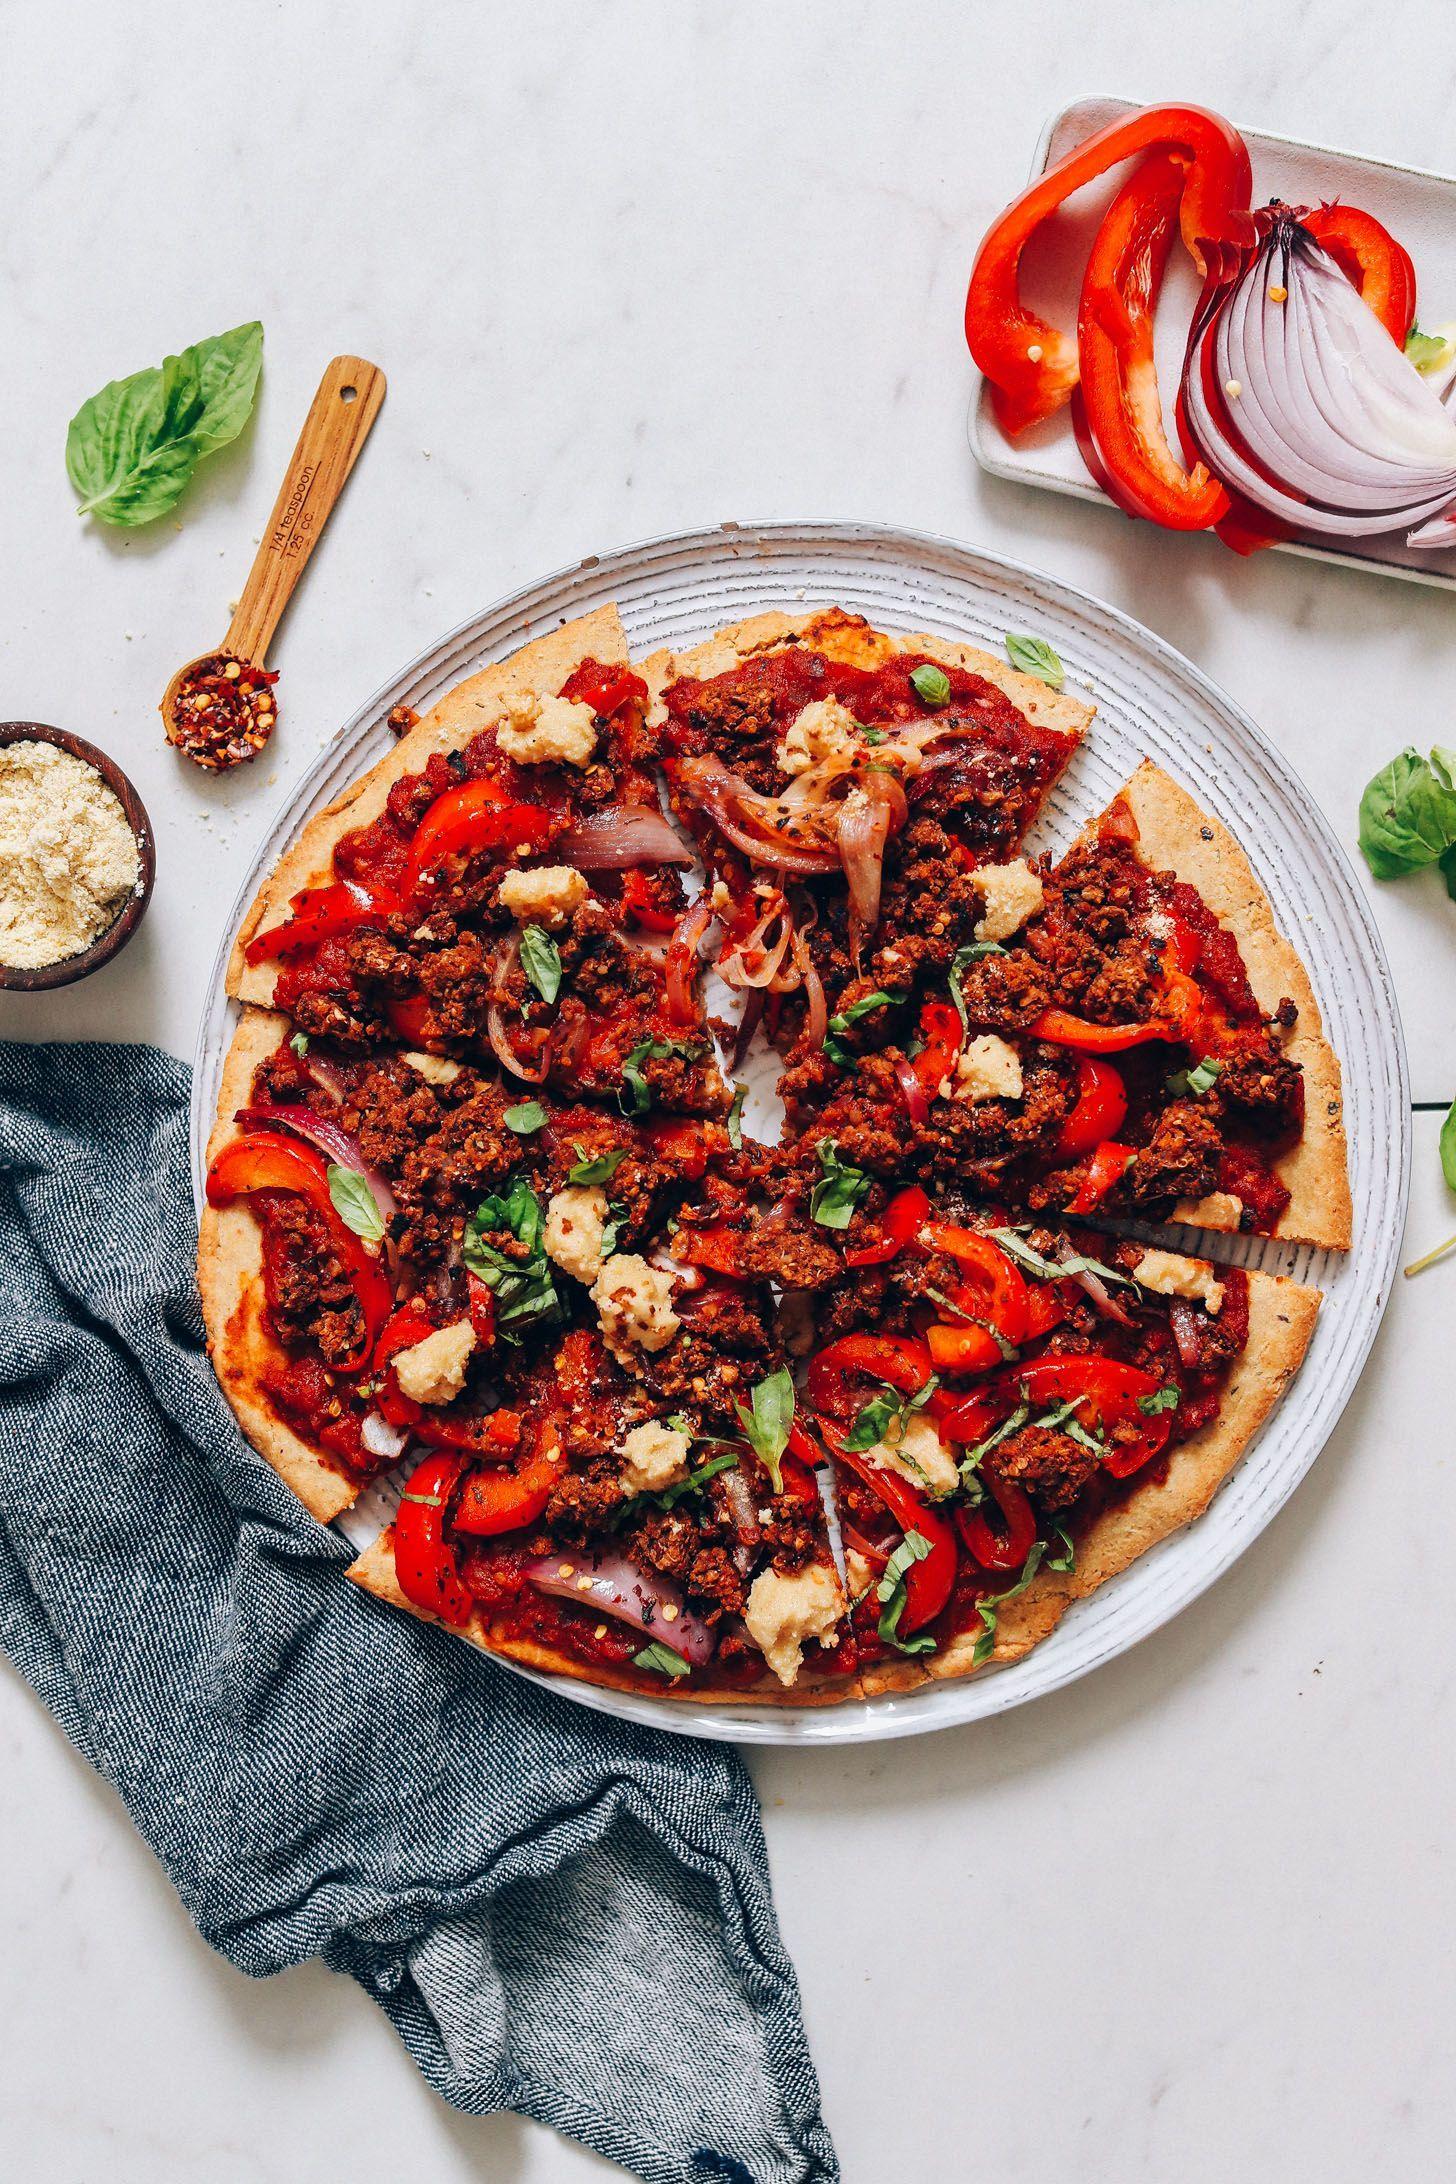 DELICIOUS GlutenFree Vegan Sausage PIZZA! 9 simple whole